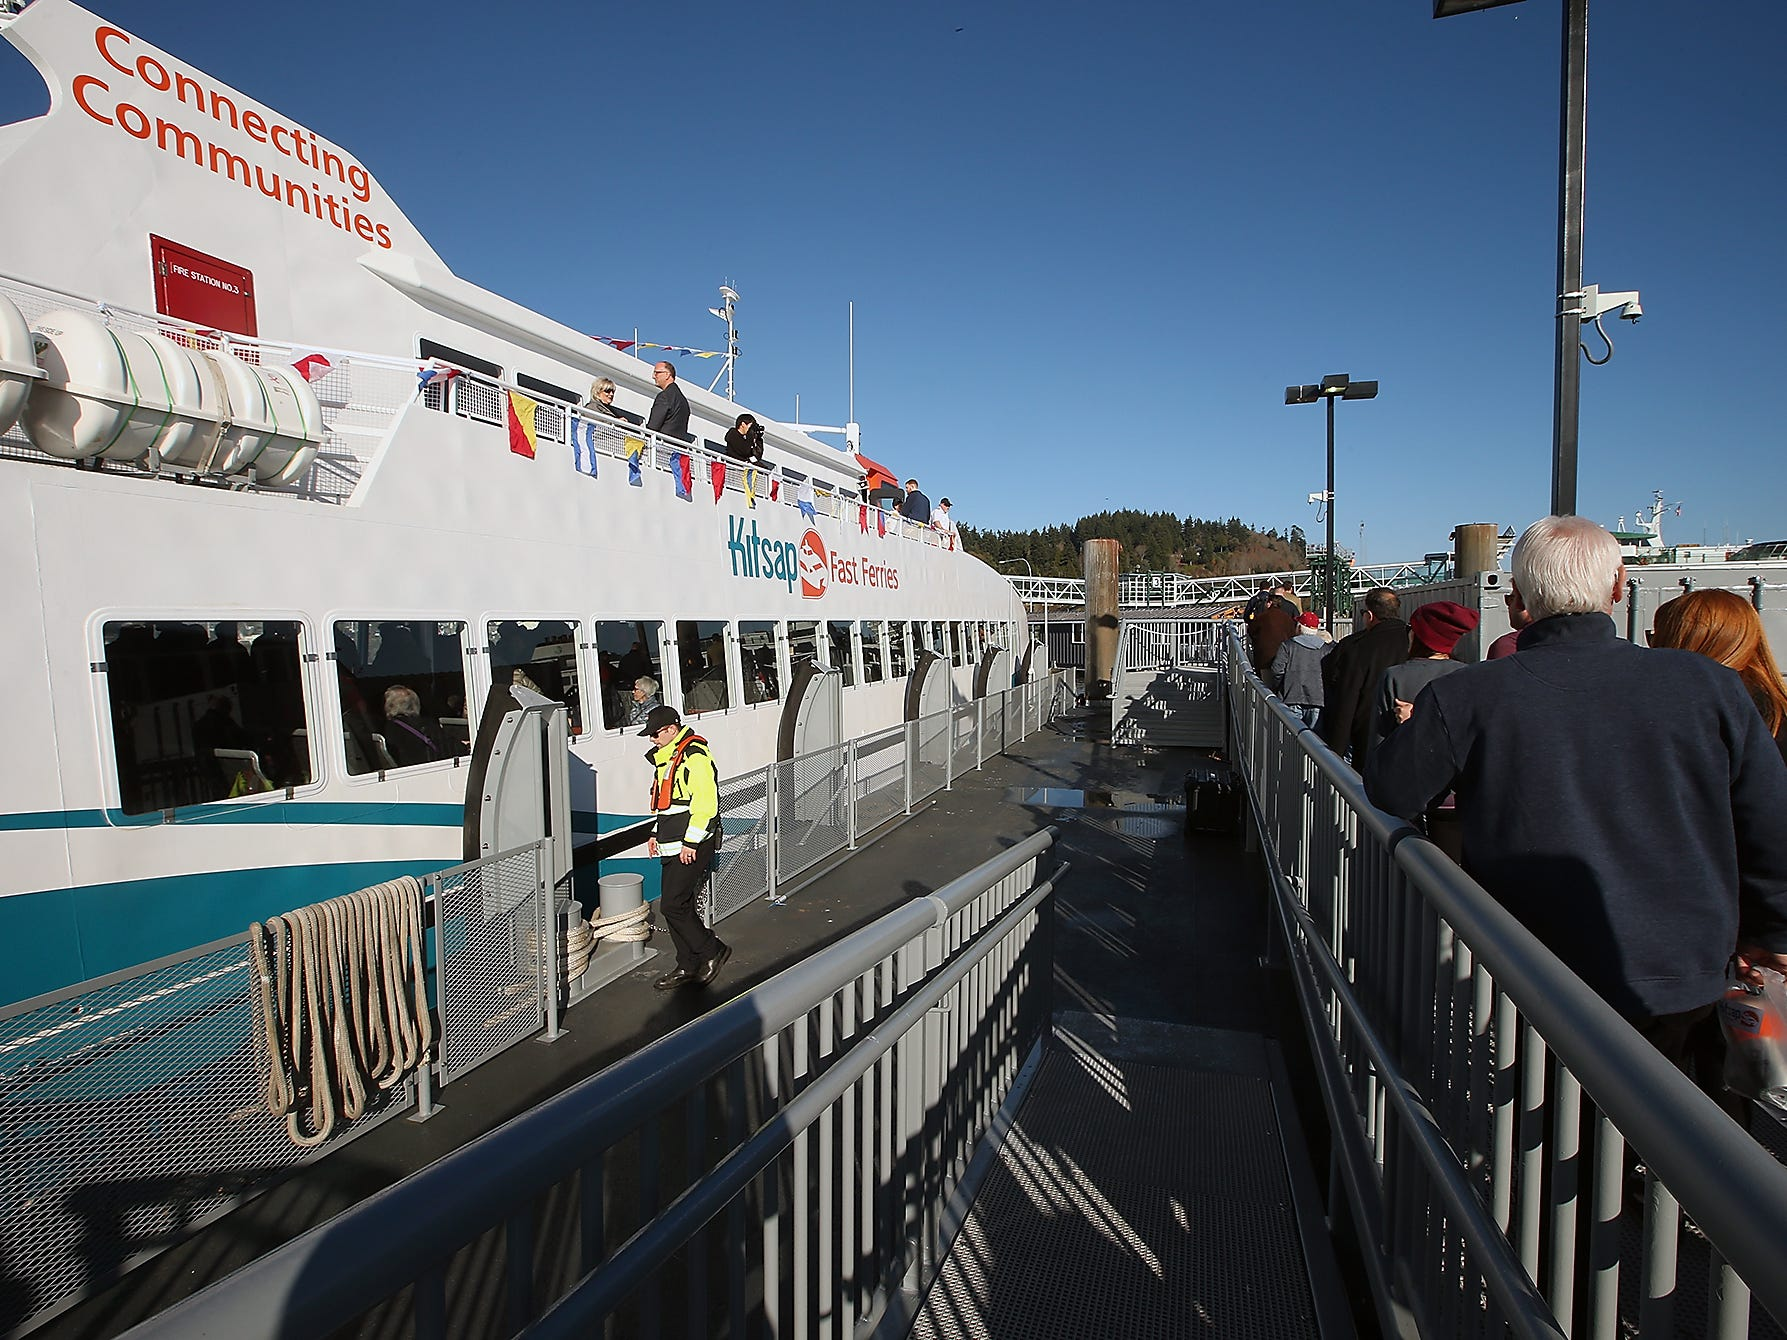 Passengers disembark the M/V Finest on Monday, November 19, 2018.